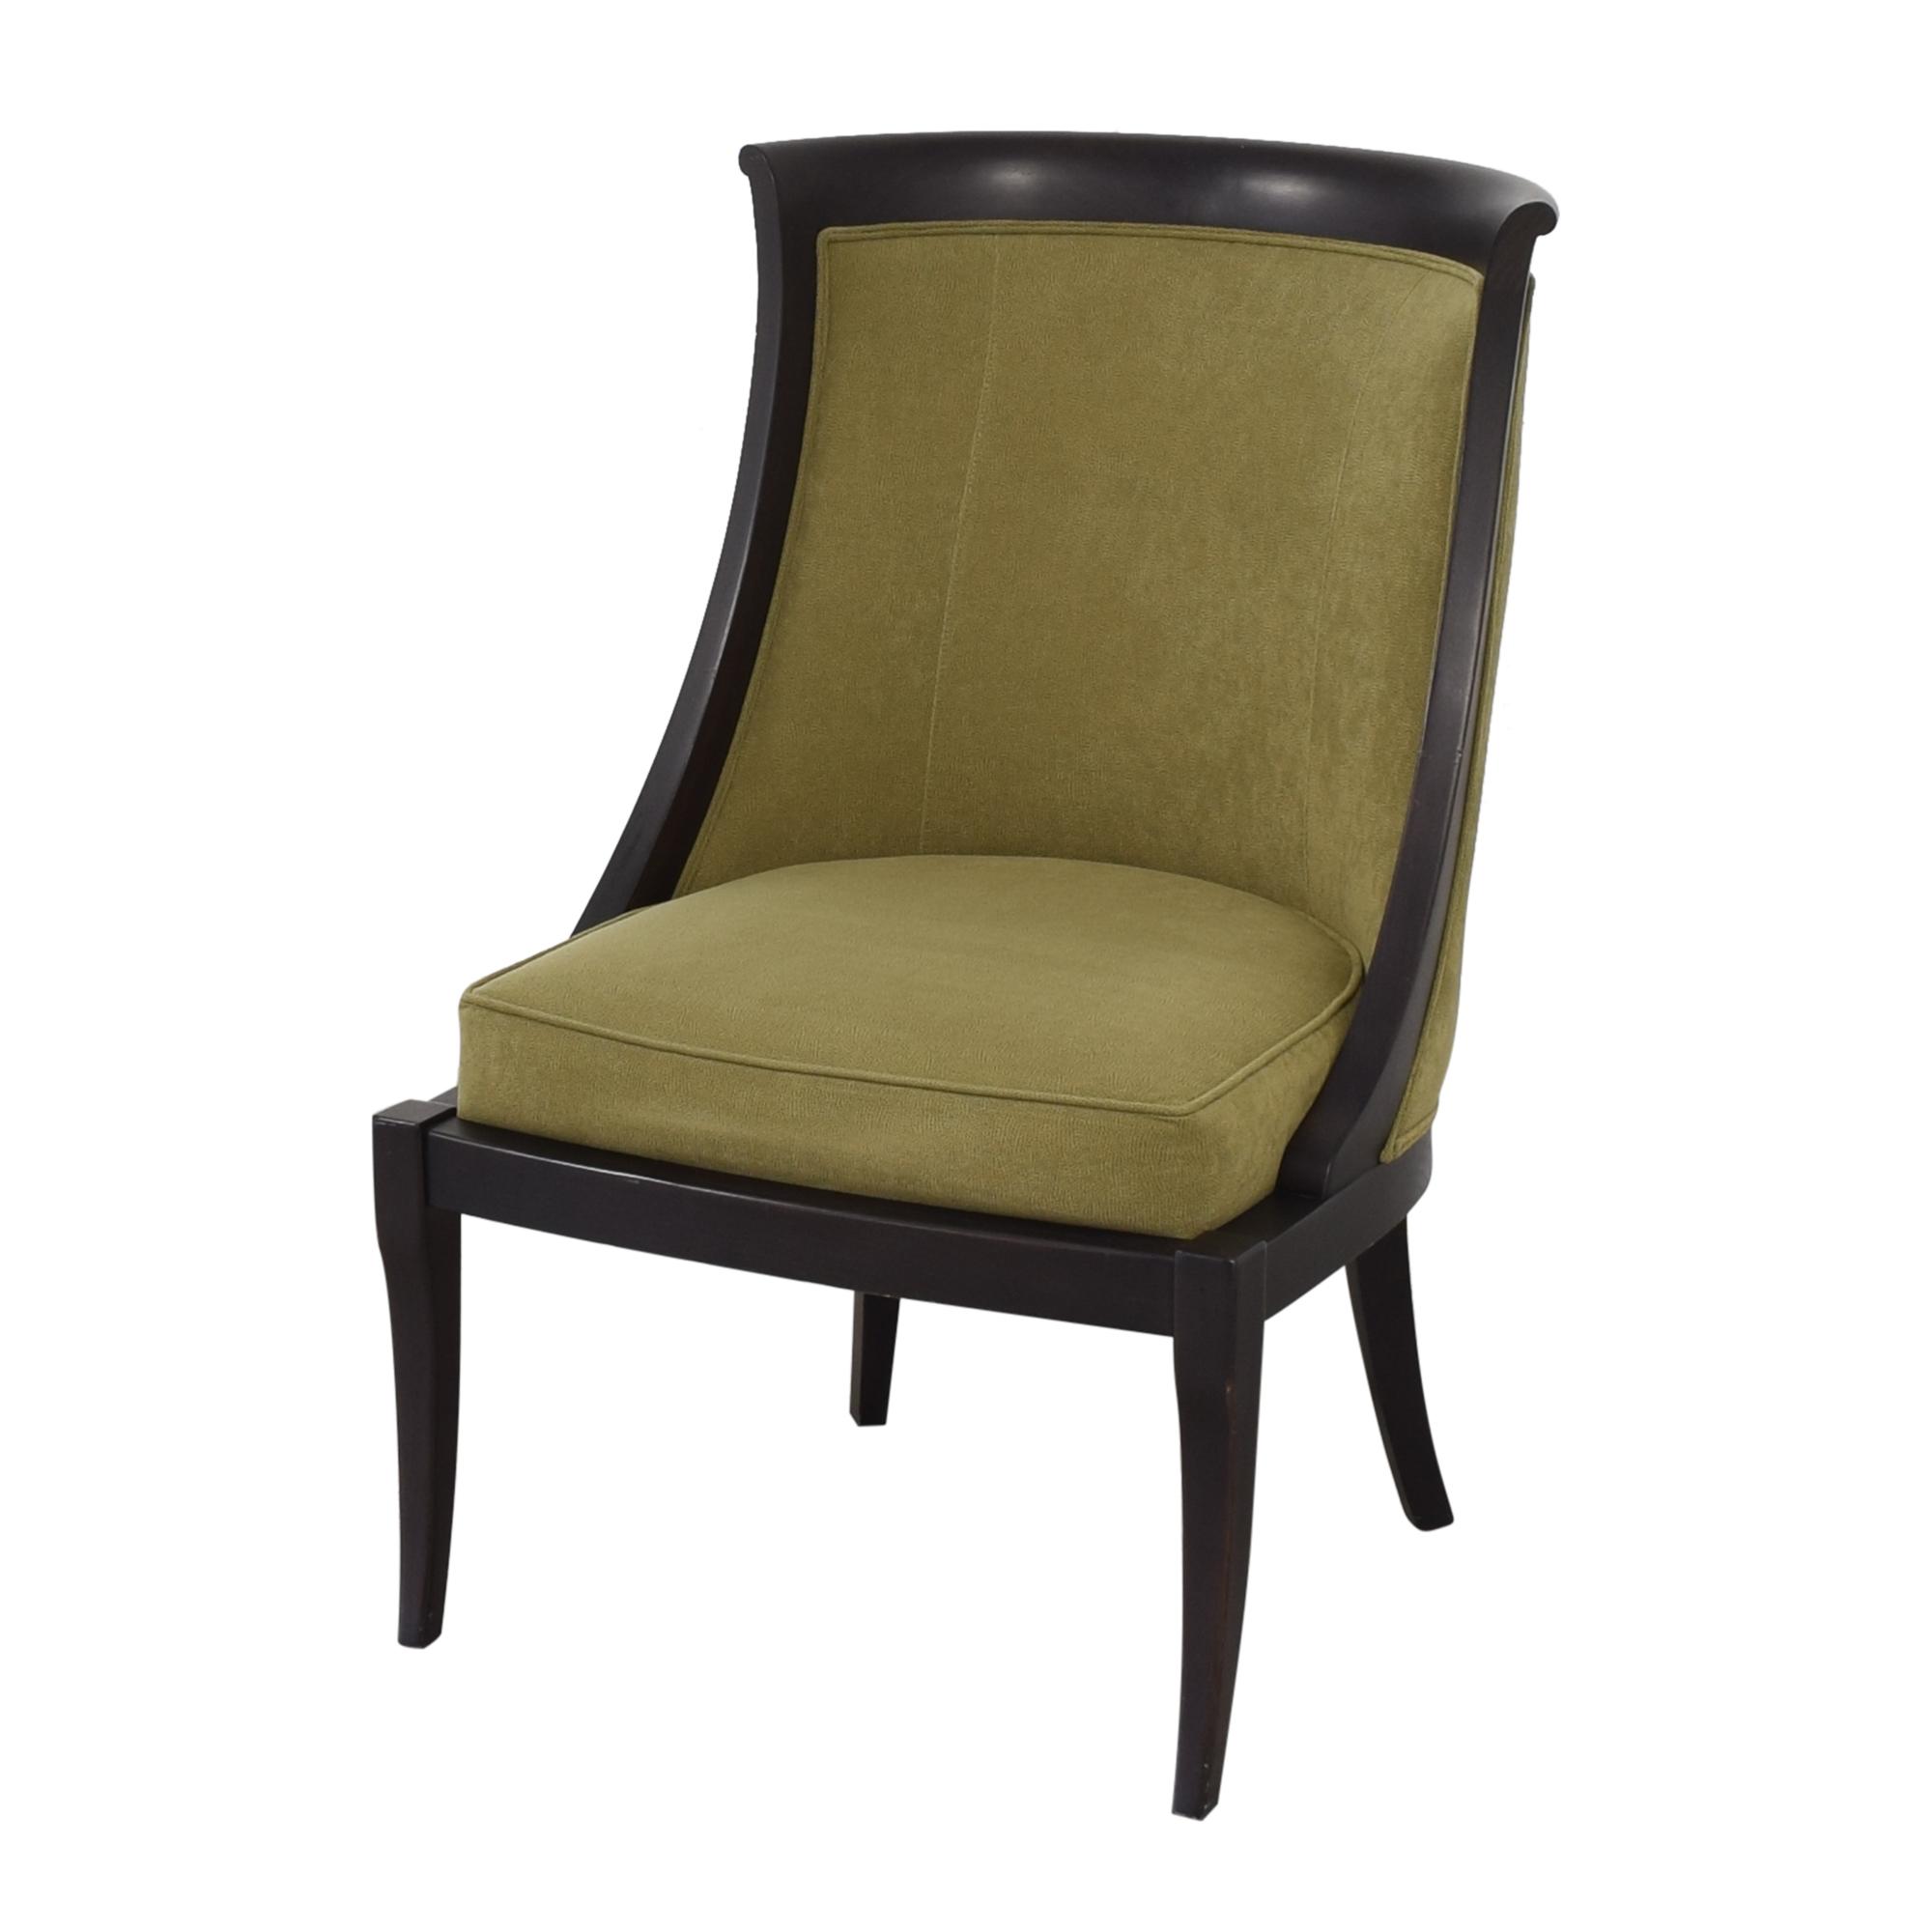 Ethan Allen Ethan Allen Accent Chair nj